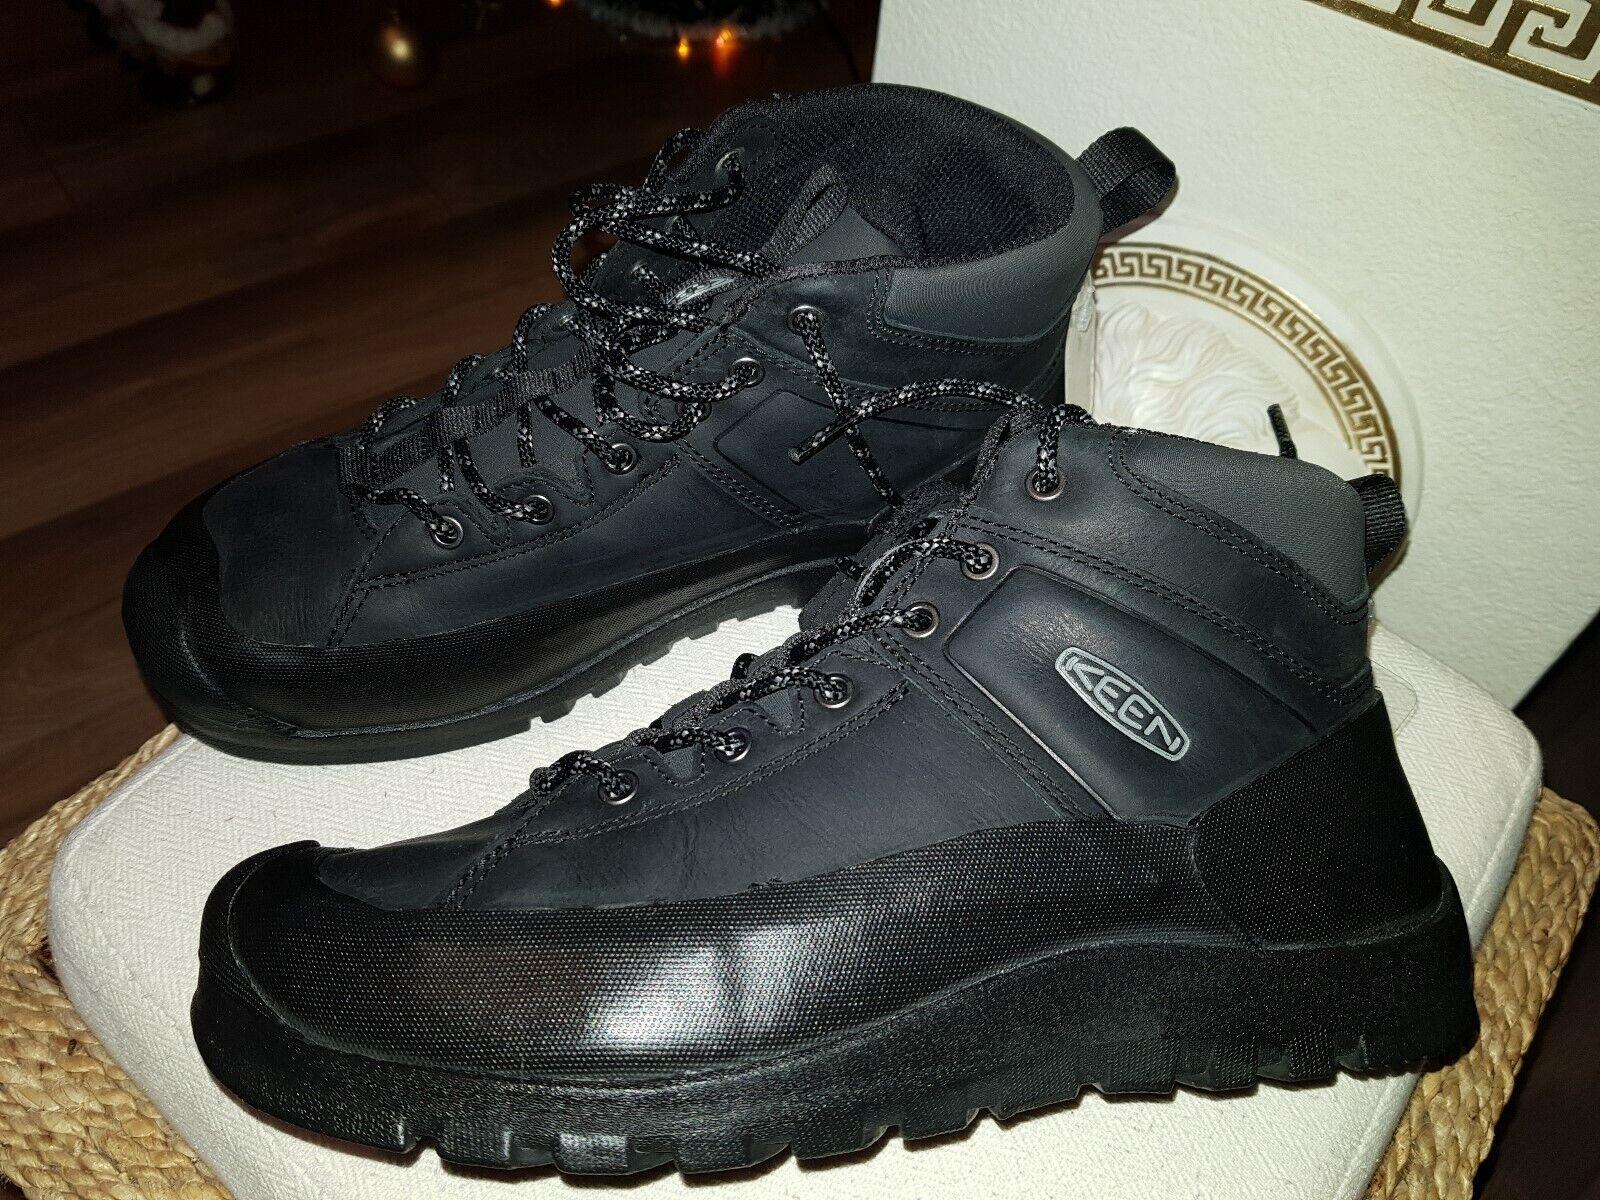 KEEN Outdoor Schuhe, HerrenStiefel, Neu mit Etikett, Gr.42, UK 8, Echtleder